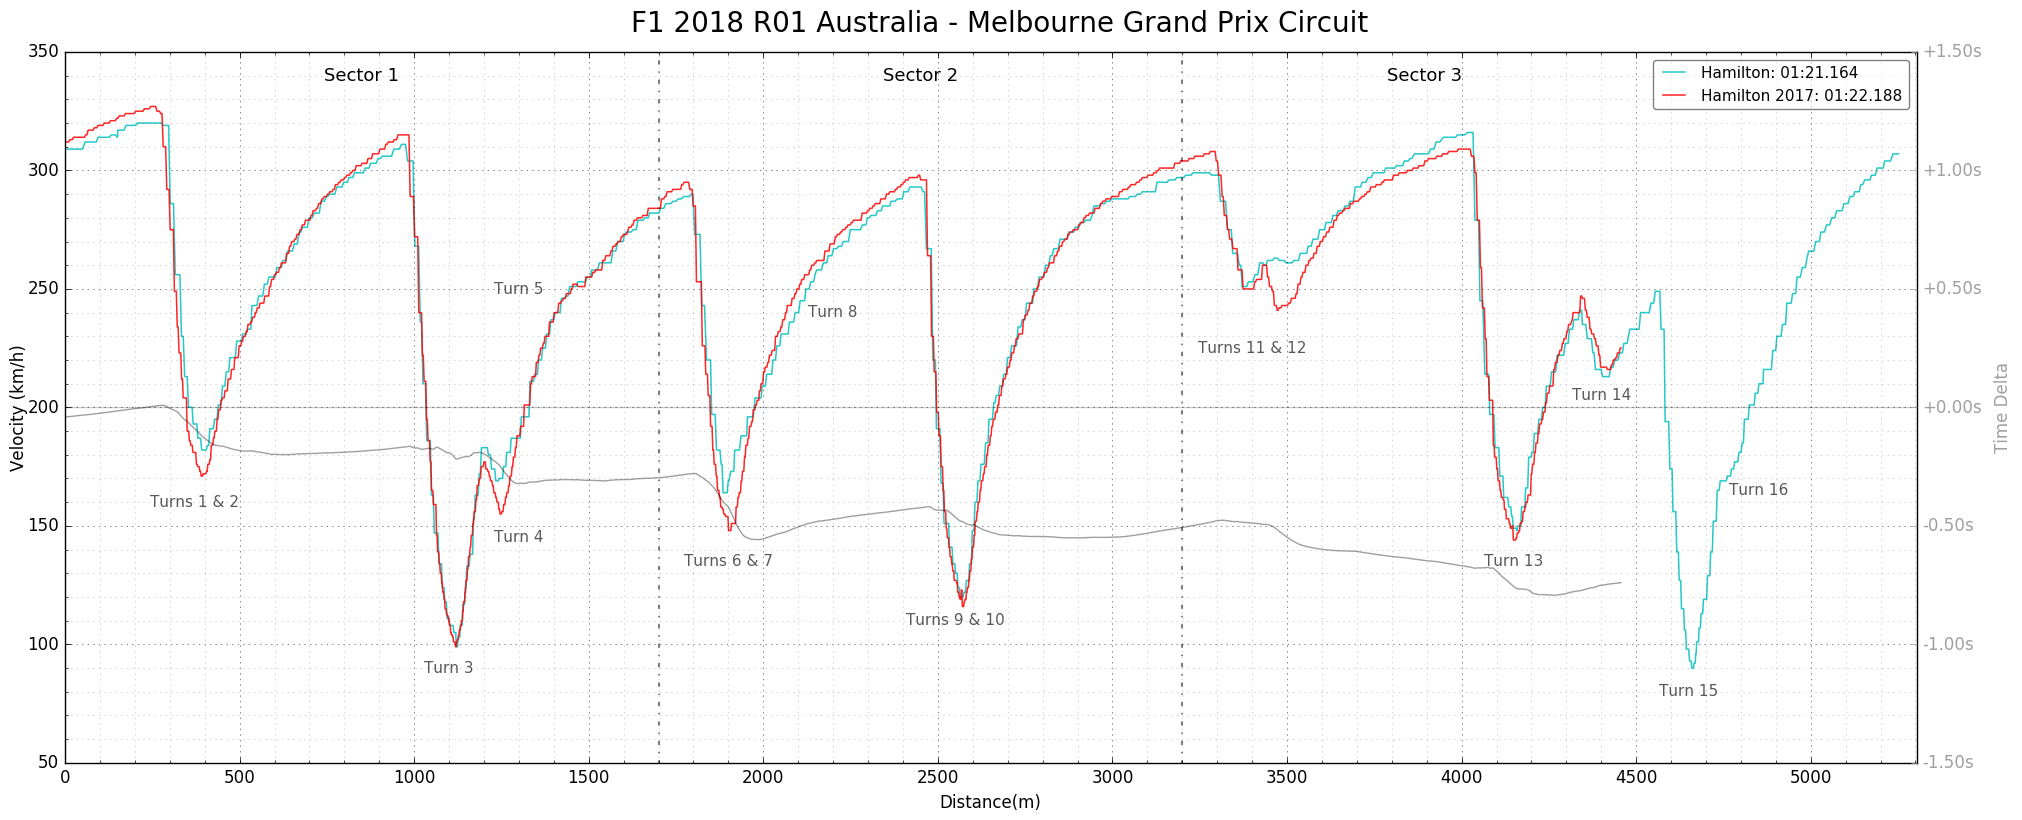 The F1 Thread